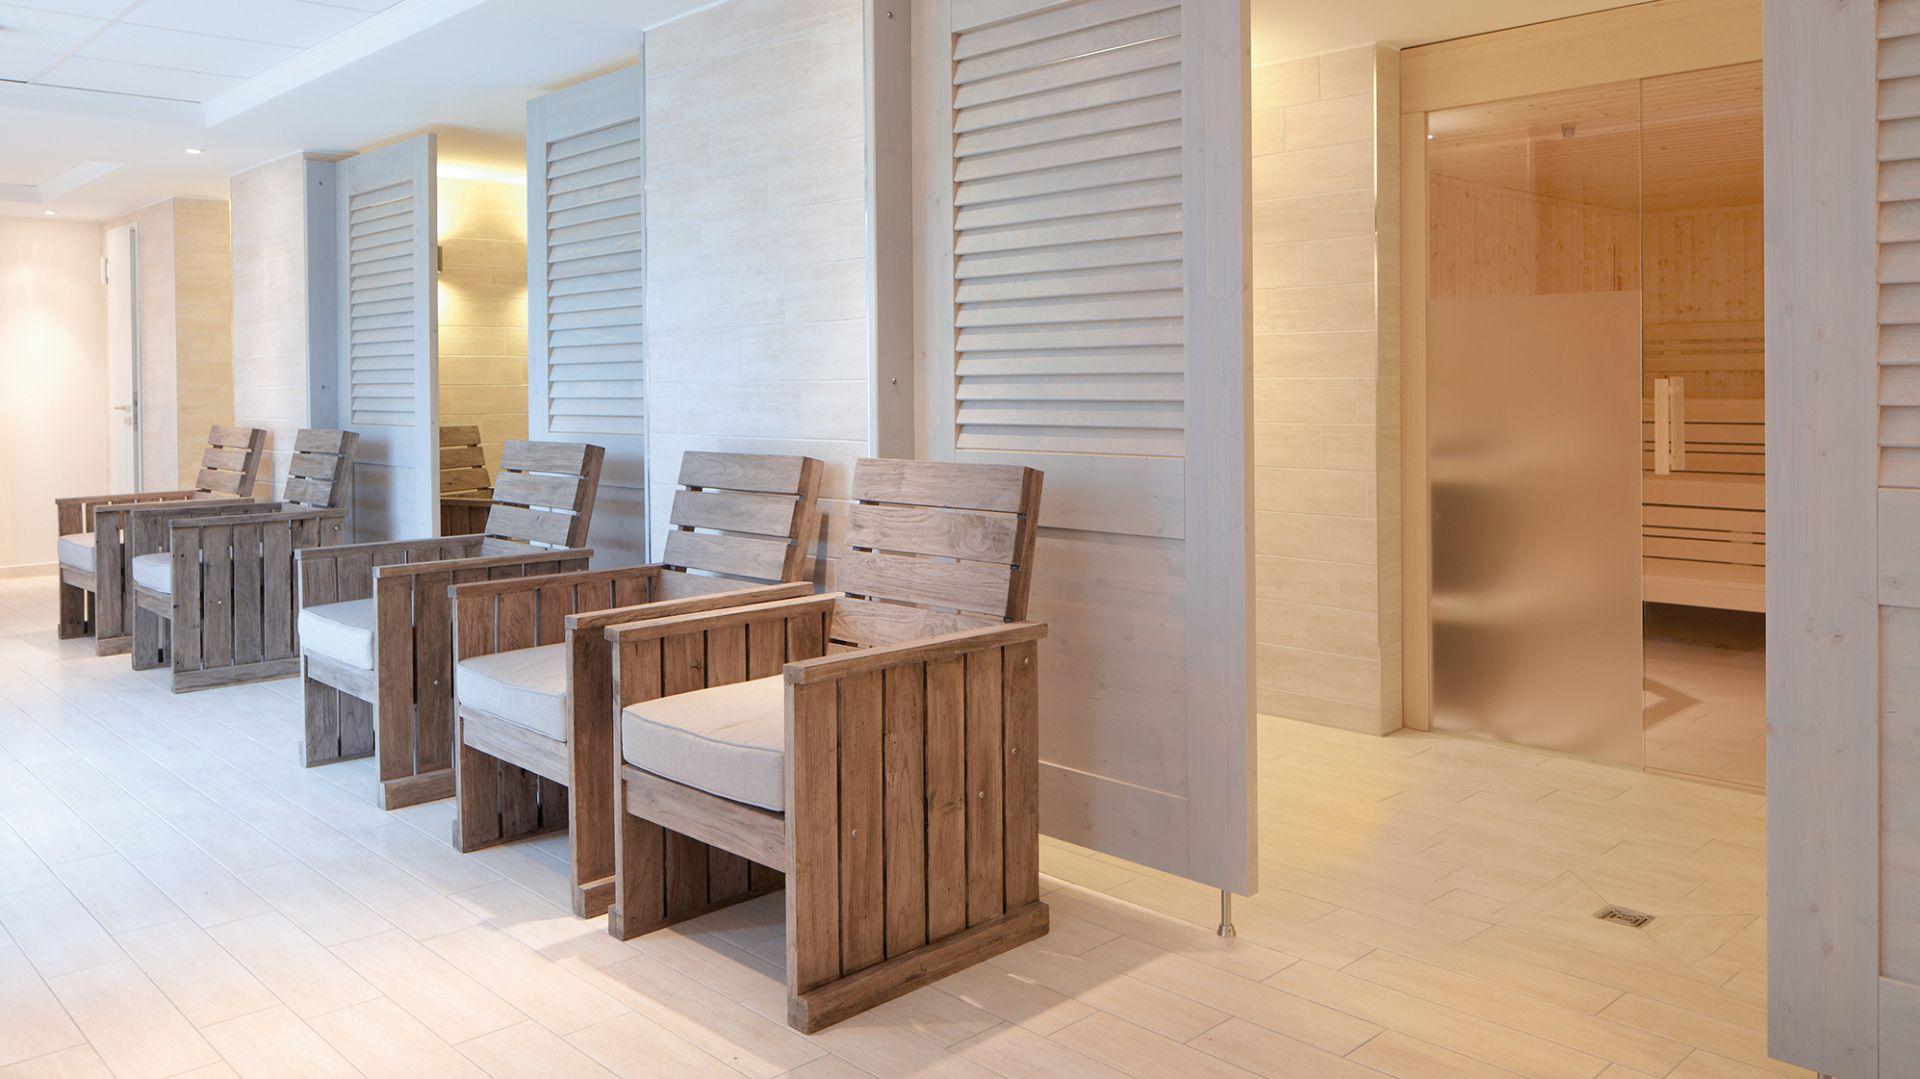 kurz und knackig beach motel st peter ording. Black Bedroom Furniture Sets. Home Design Ideas